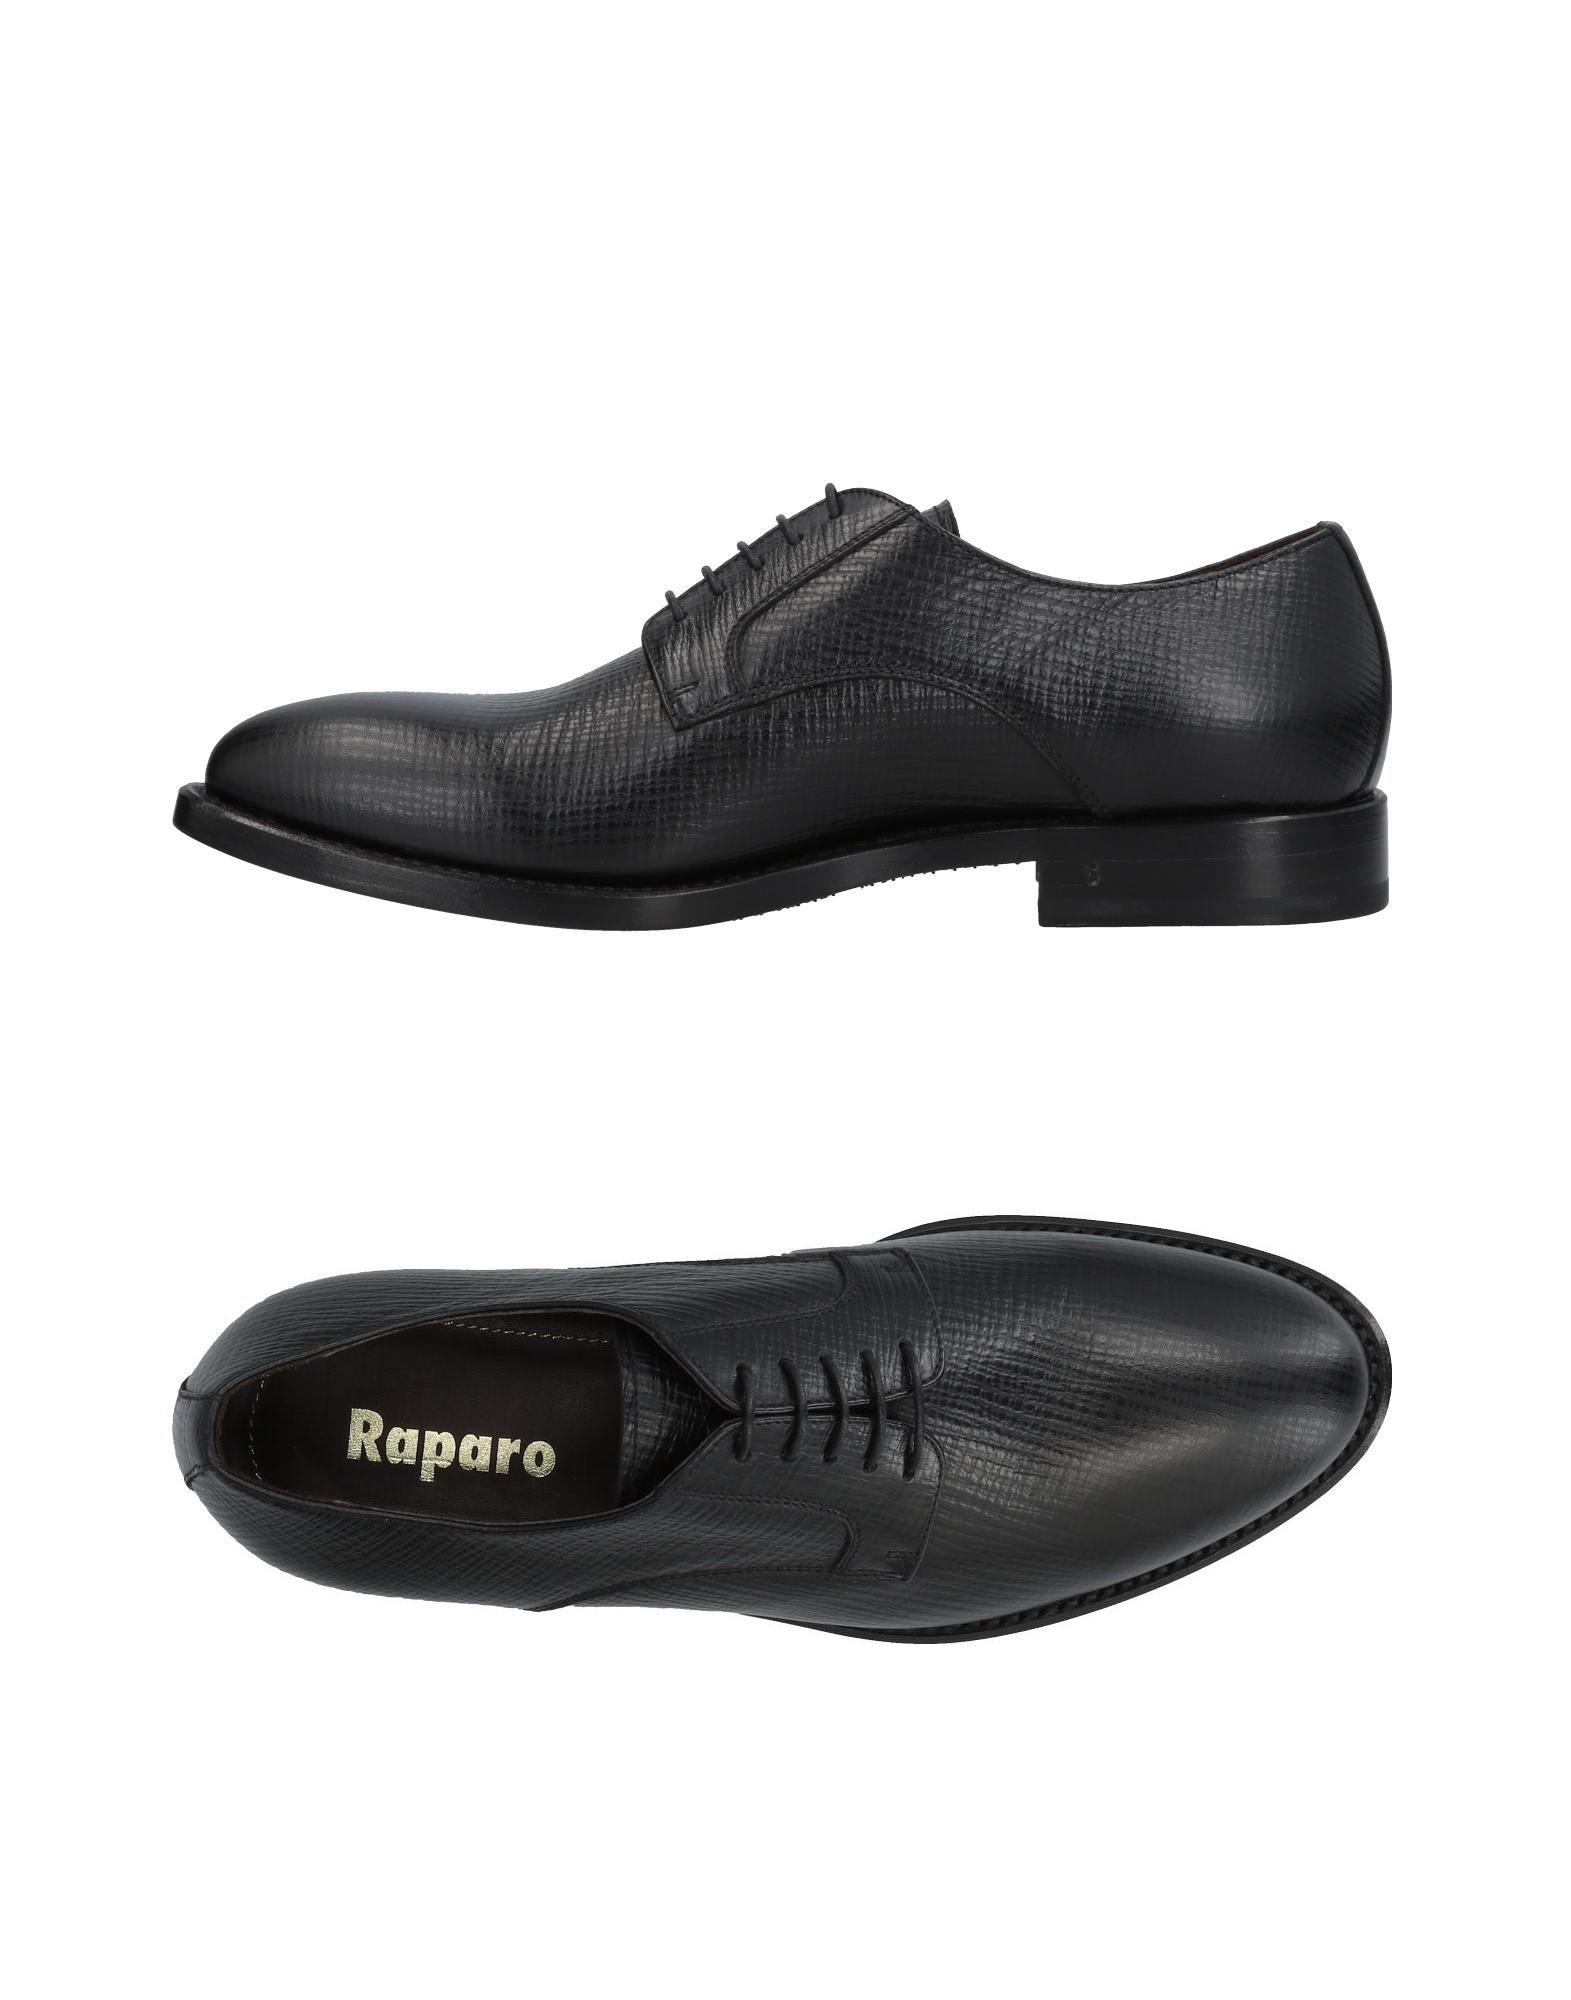 Raparo Schnürschuhe Herren beliebte  11459332KK Gute Qualität beliebte Herren Schuhe 8b84de